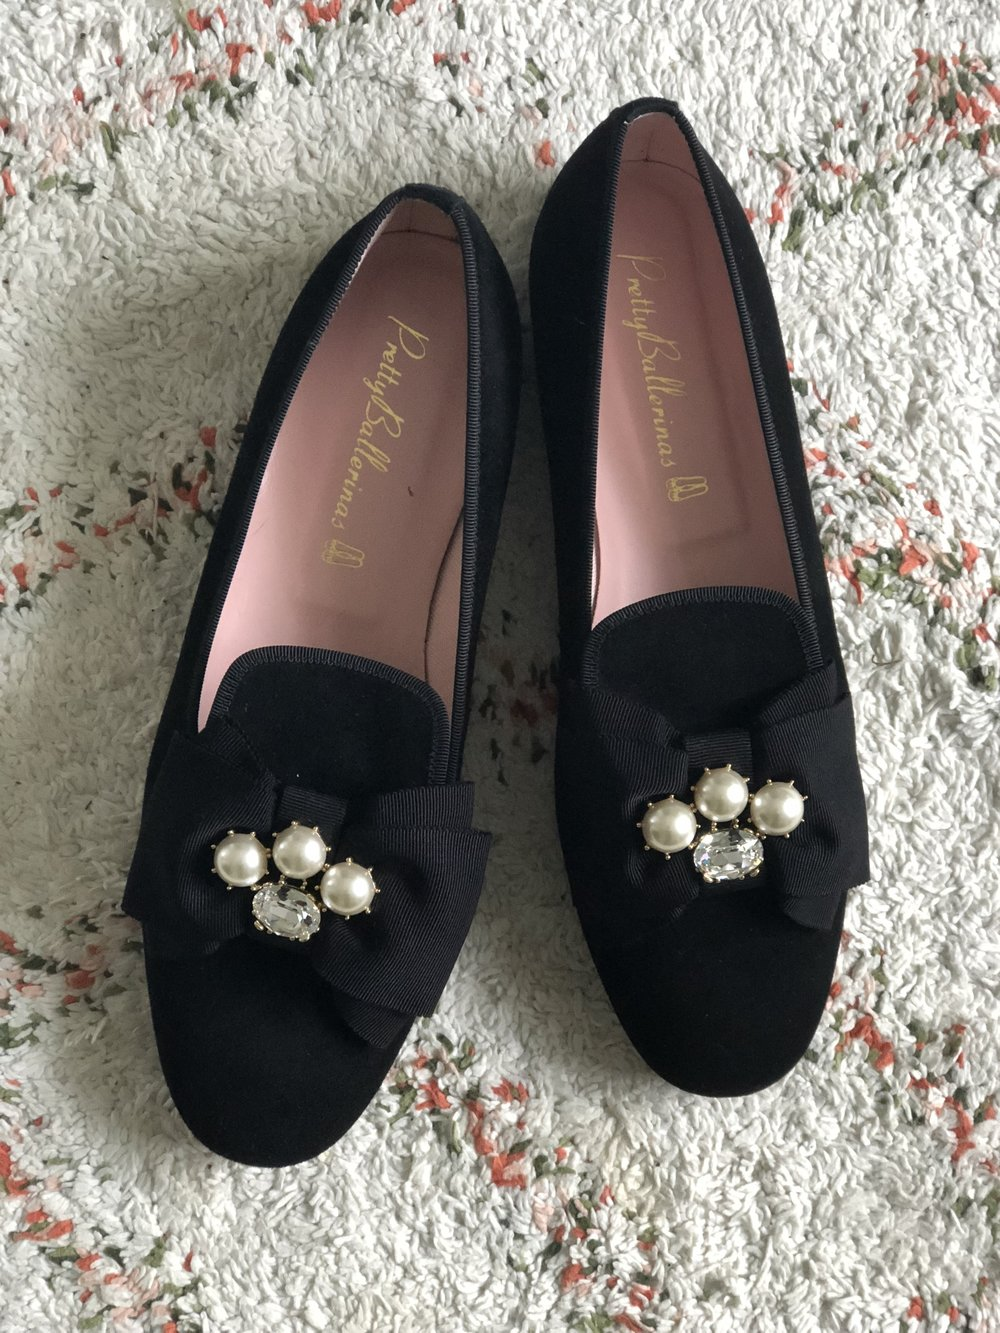 sko fra  Pretty ballerinas  købt på tilbud 1125 kr.